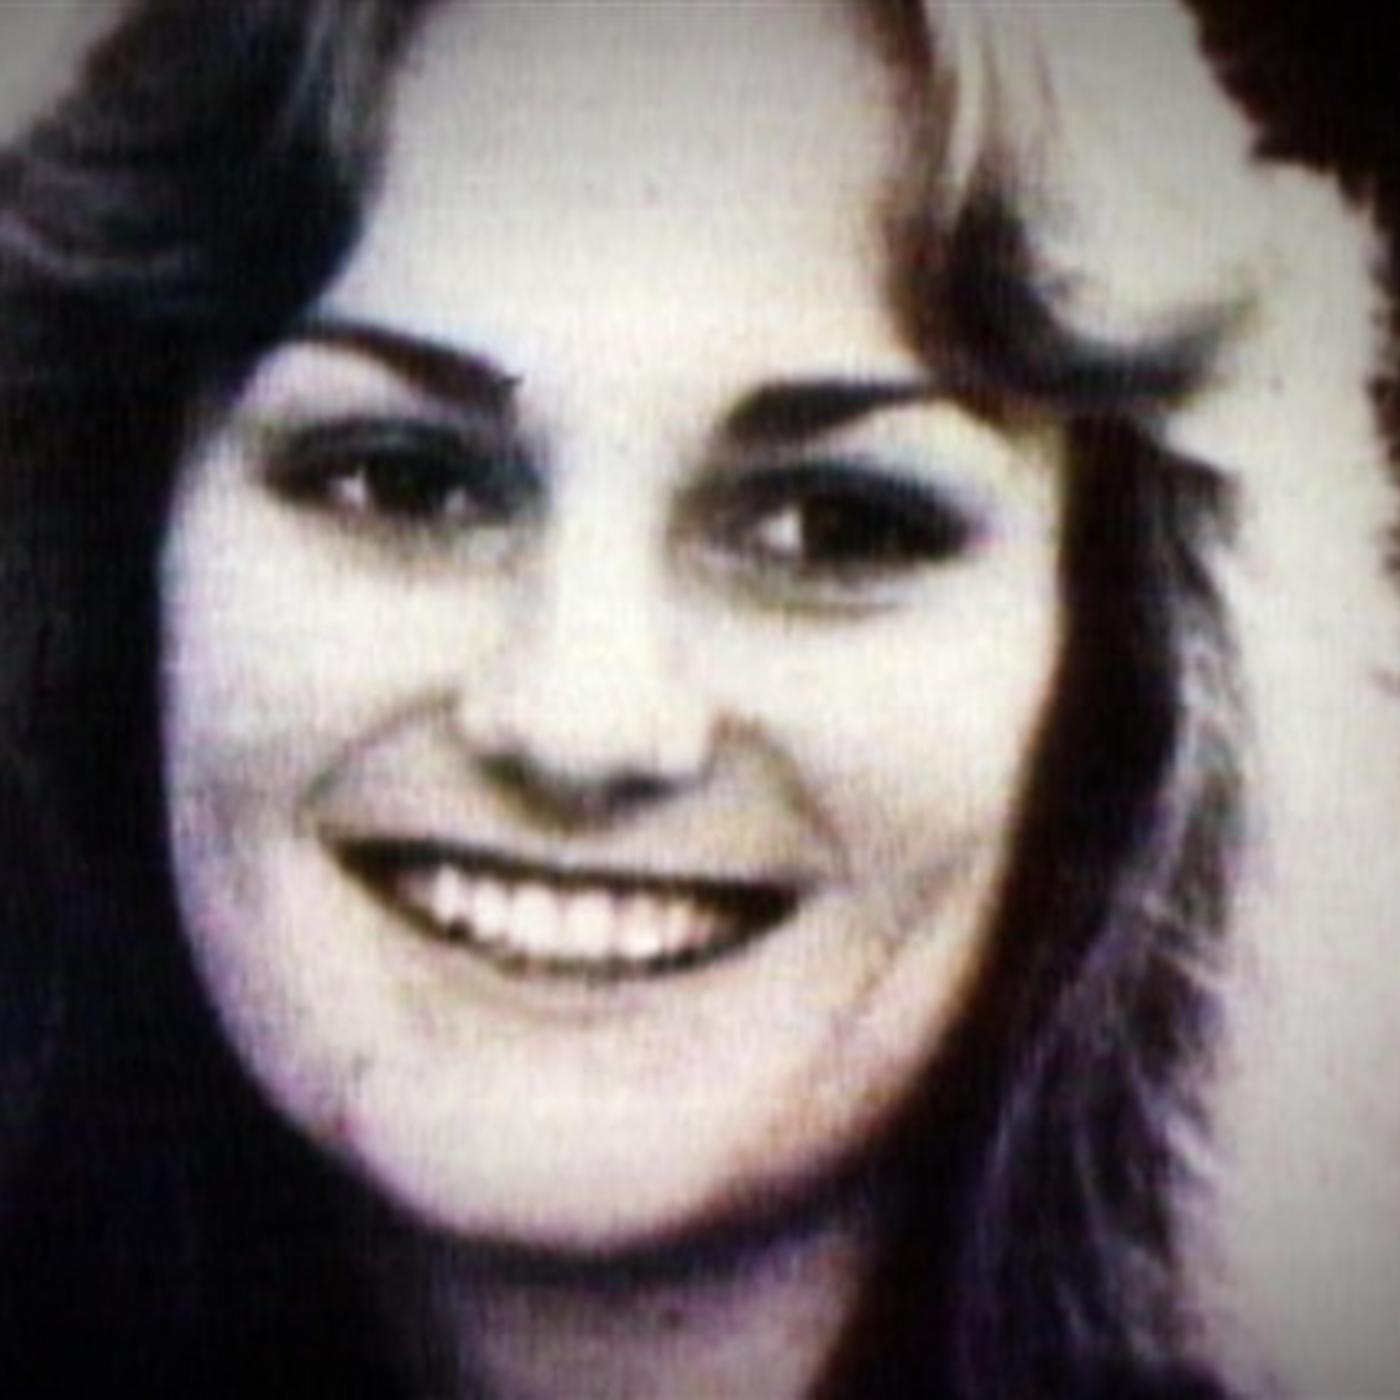 54: Patty Hearst